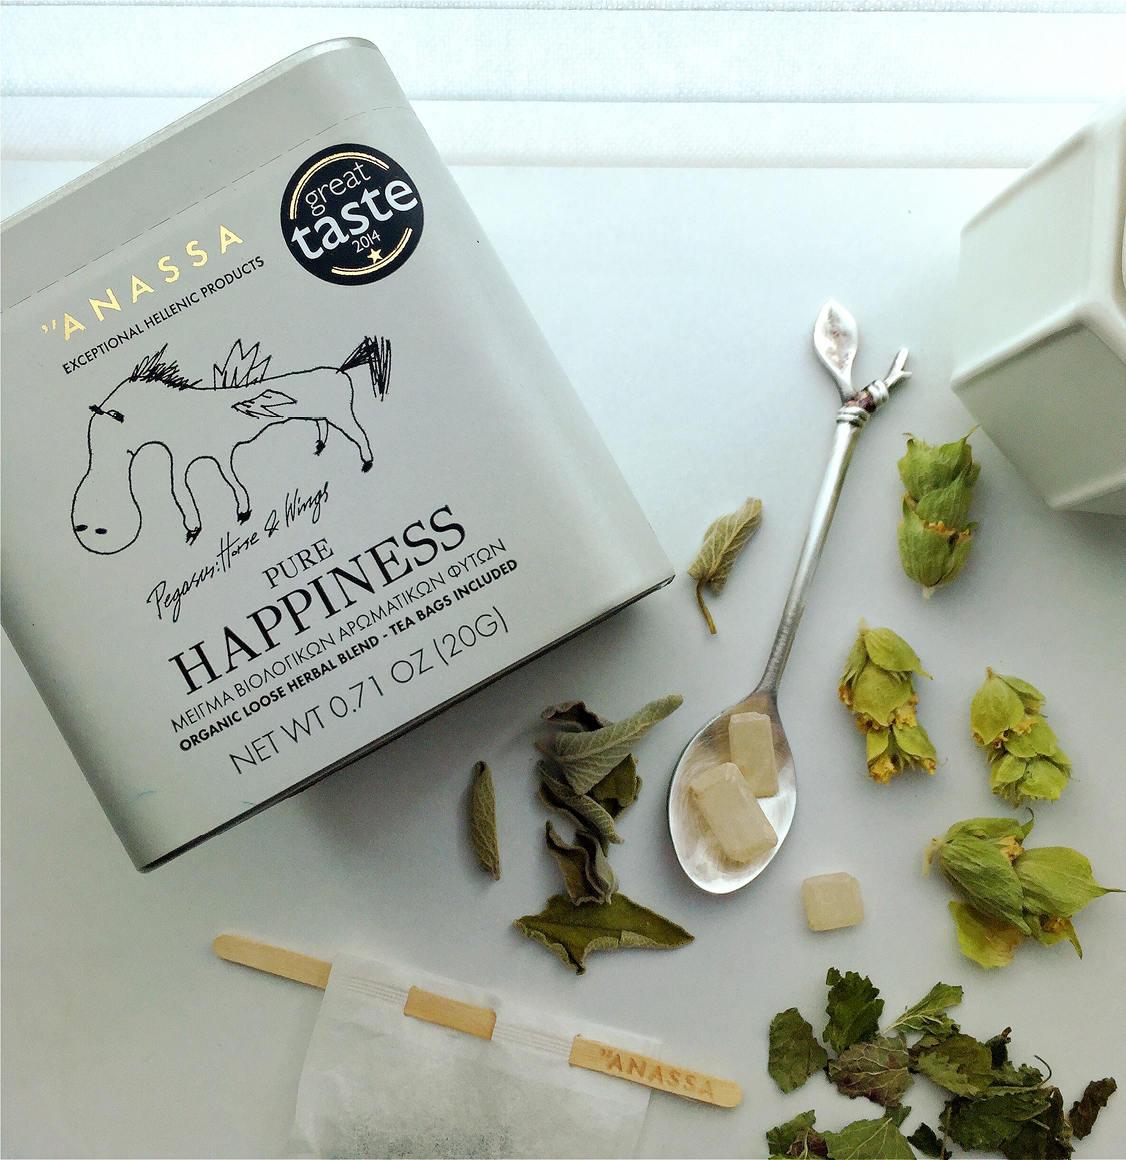 Anassa Organics Pure Happiness Tin Μείγμα Βιολογικών Βοτάνων